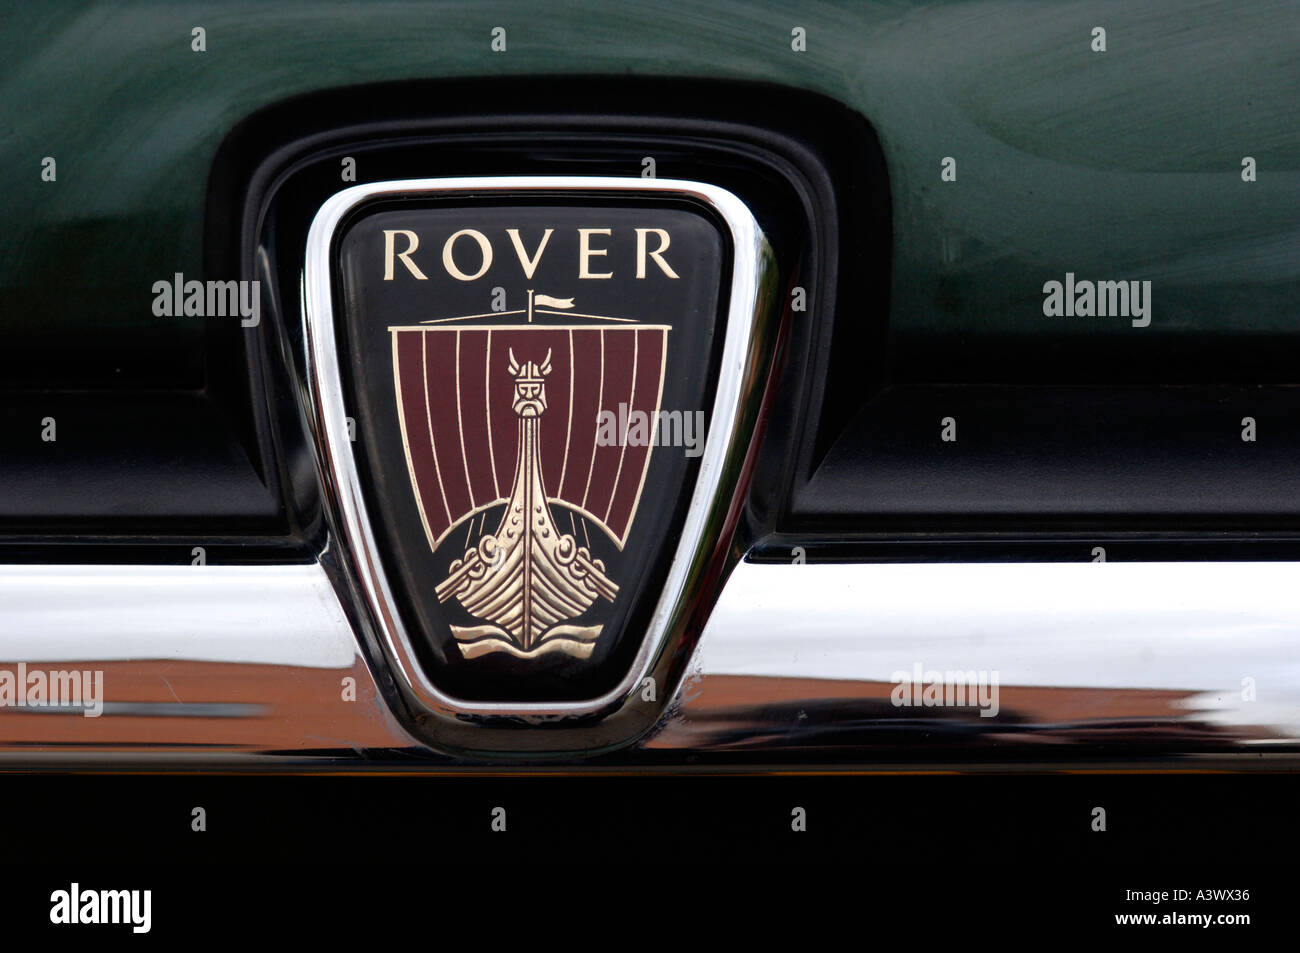 Rover car badge - Stock Image